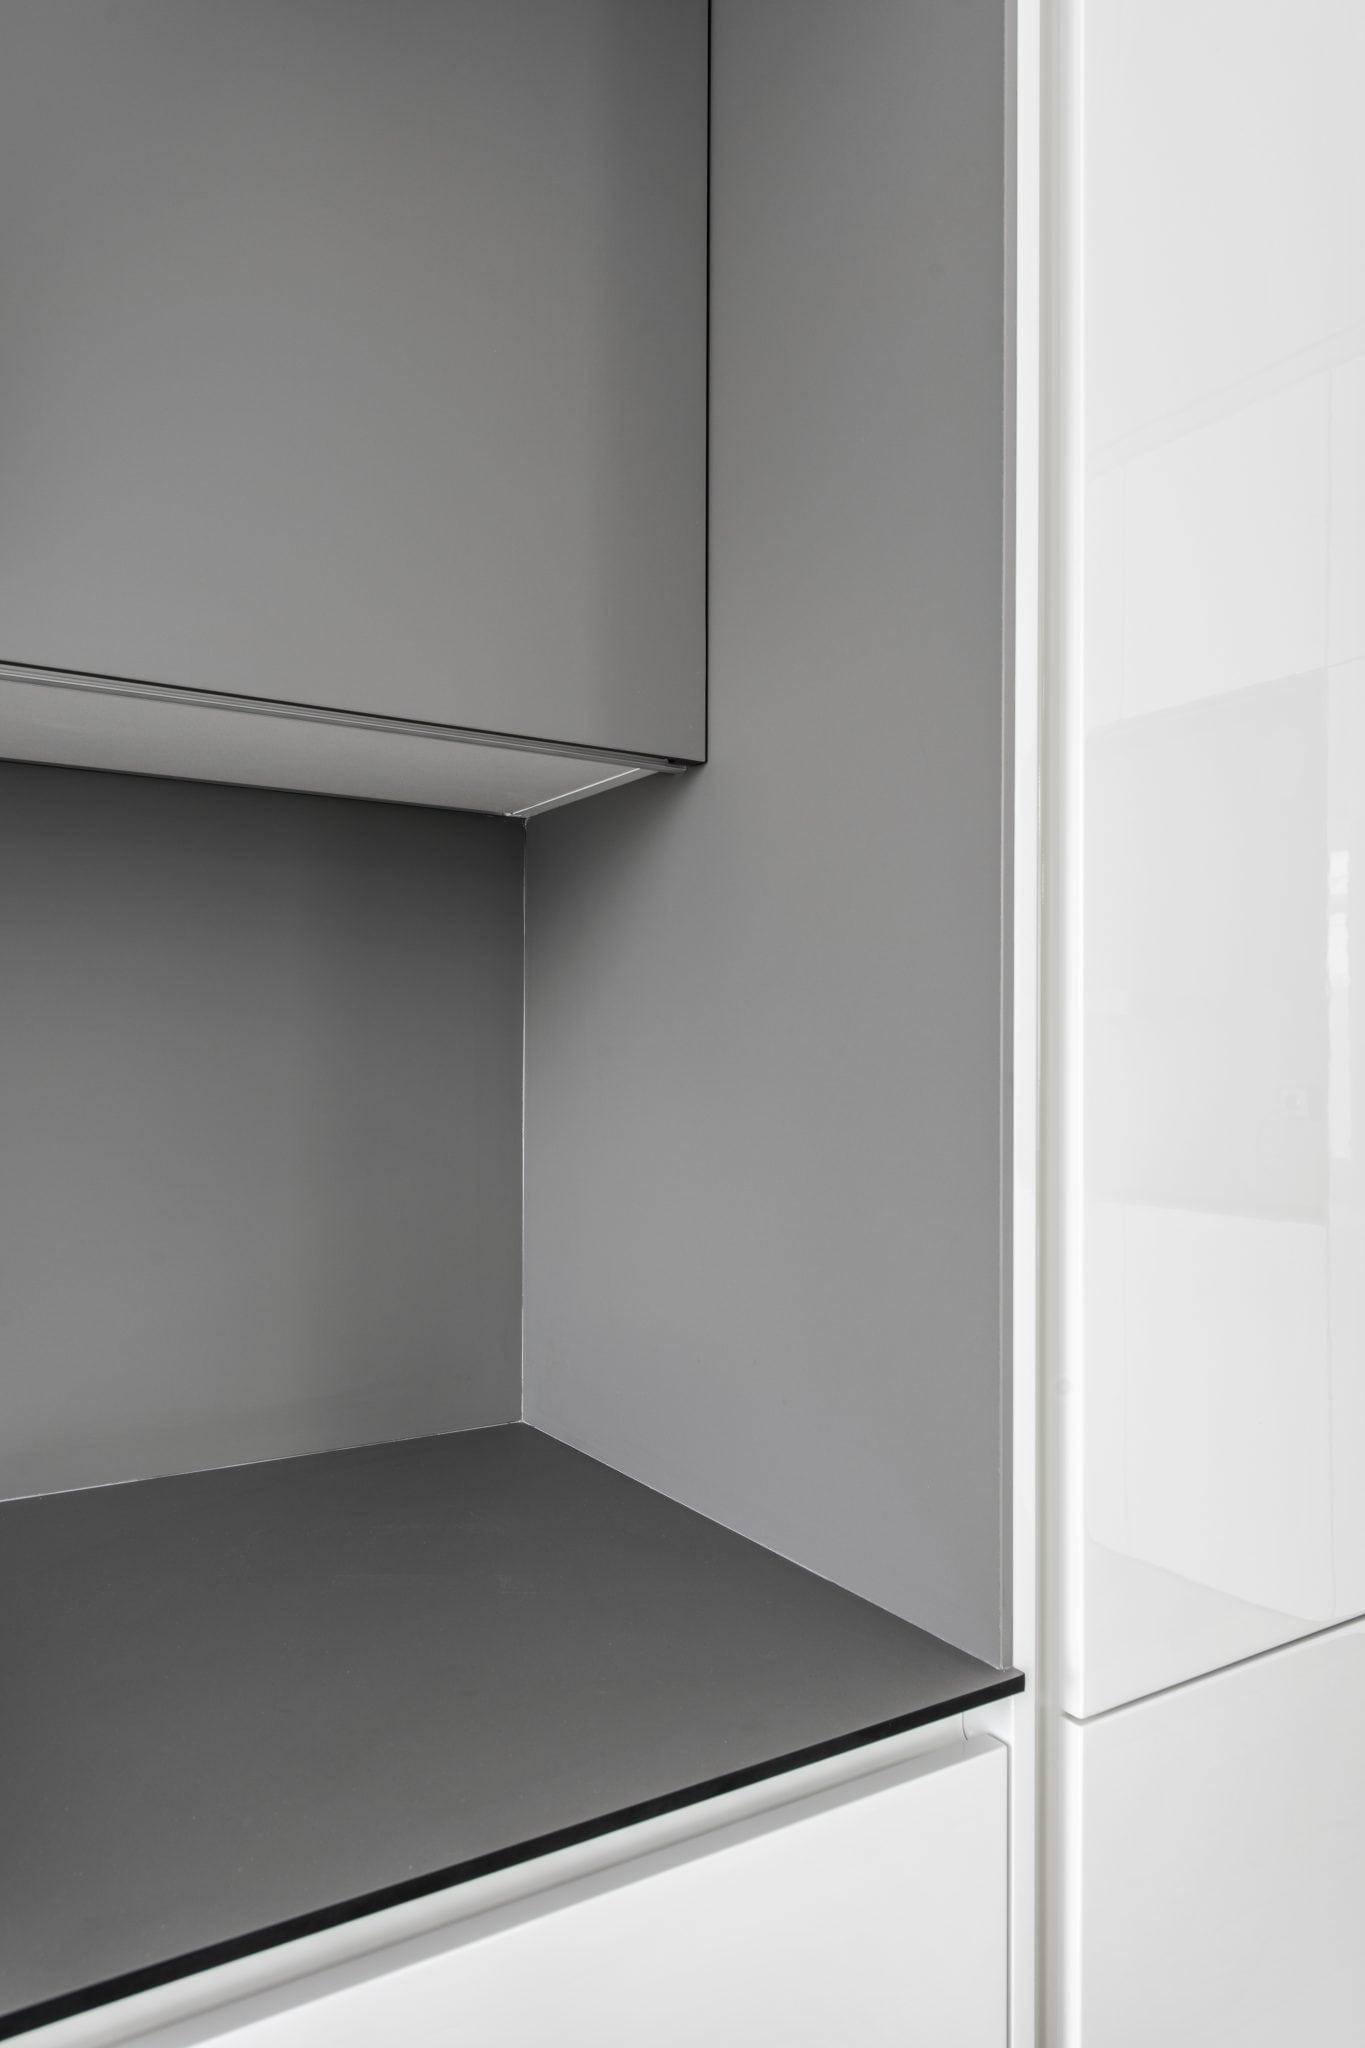 Individualiu baldu gamyba balta virtuve Zverynas